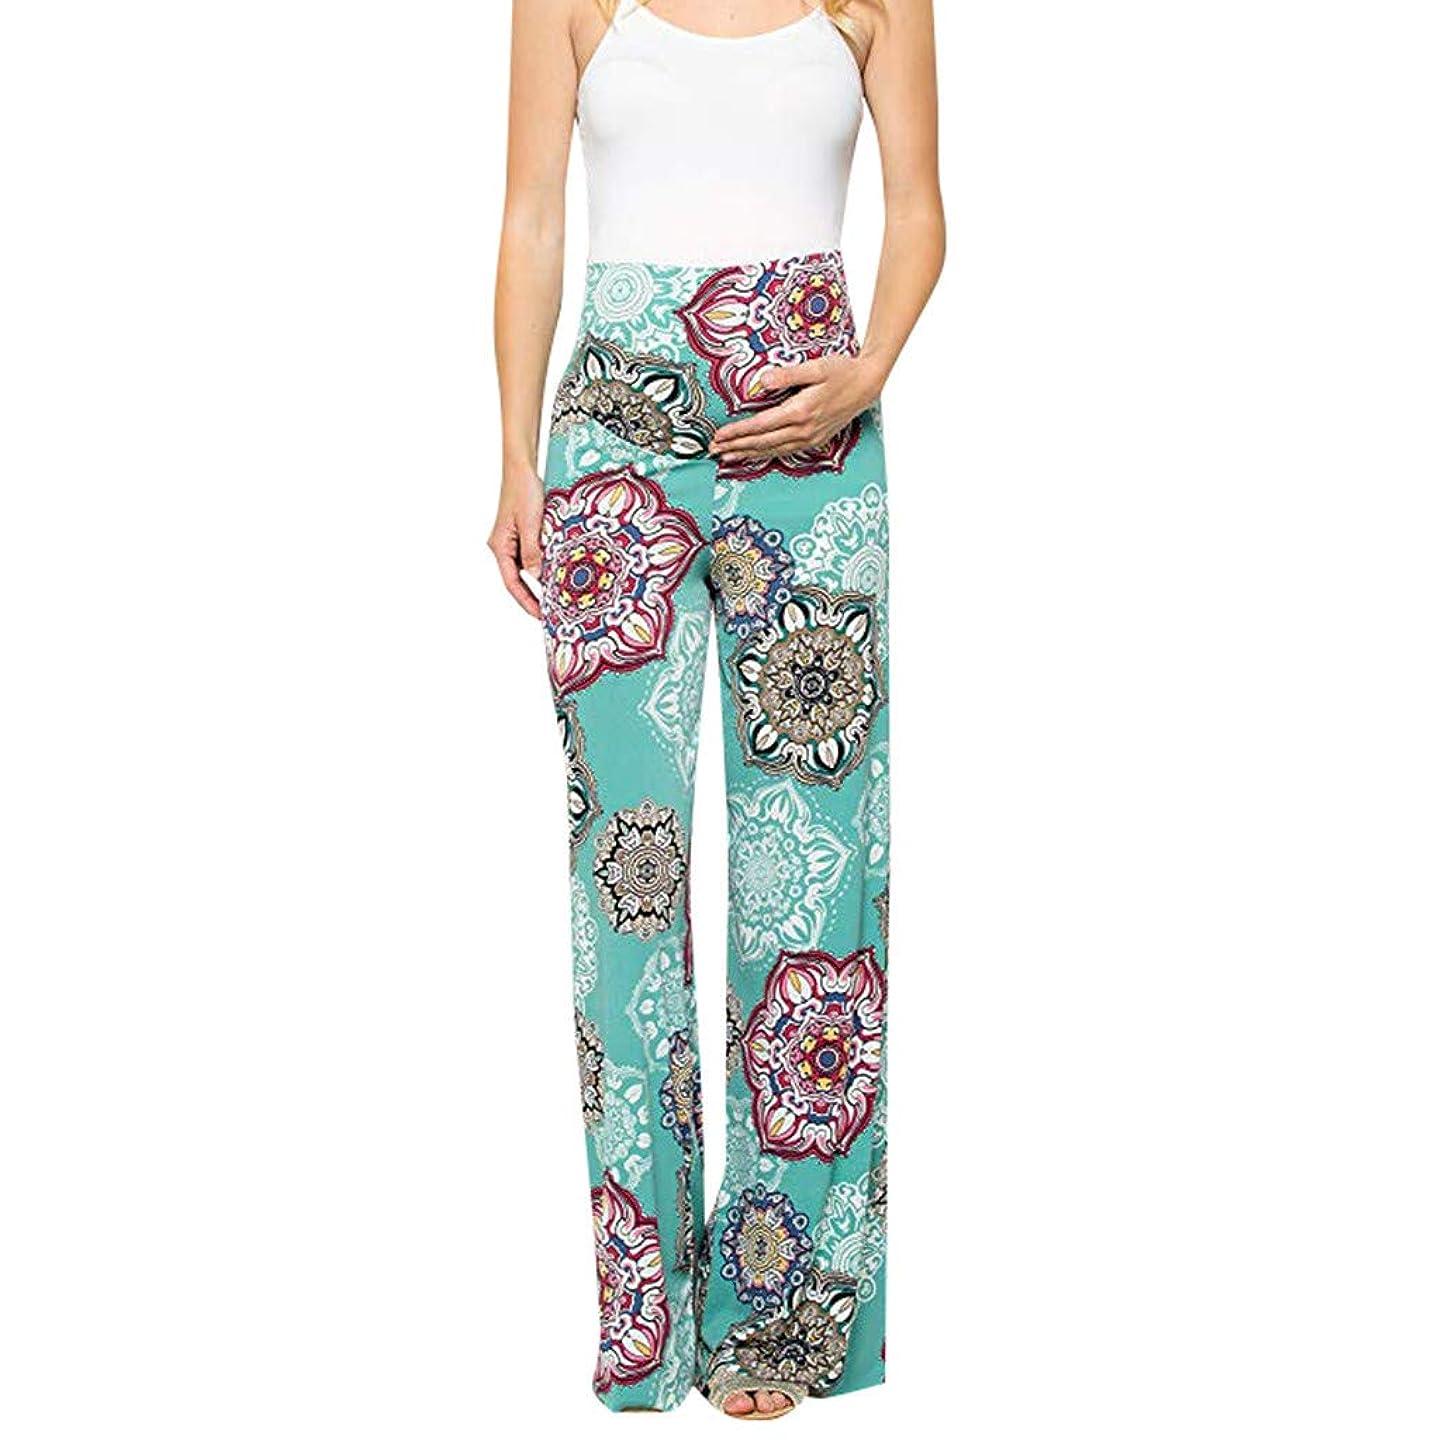 Women's Maternity Stretch Bohemian Floral Print Damask Palazzo Wide Leg Lounge Pants W/Tummy Control